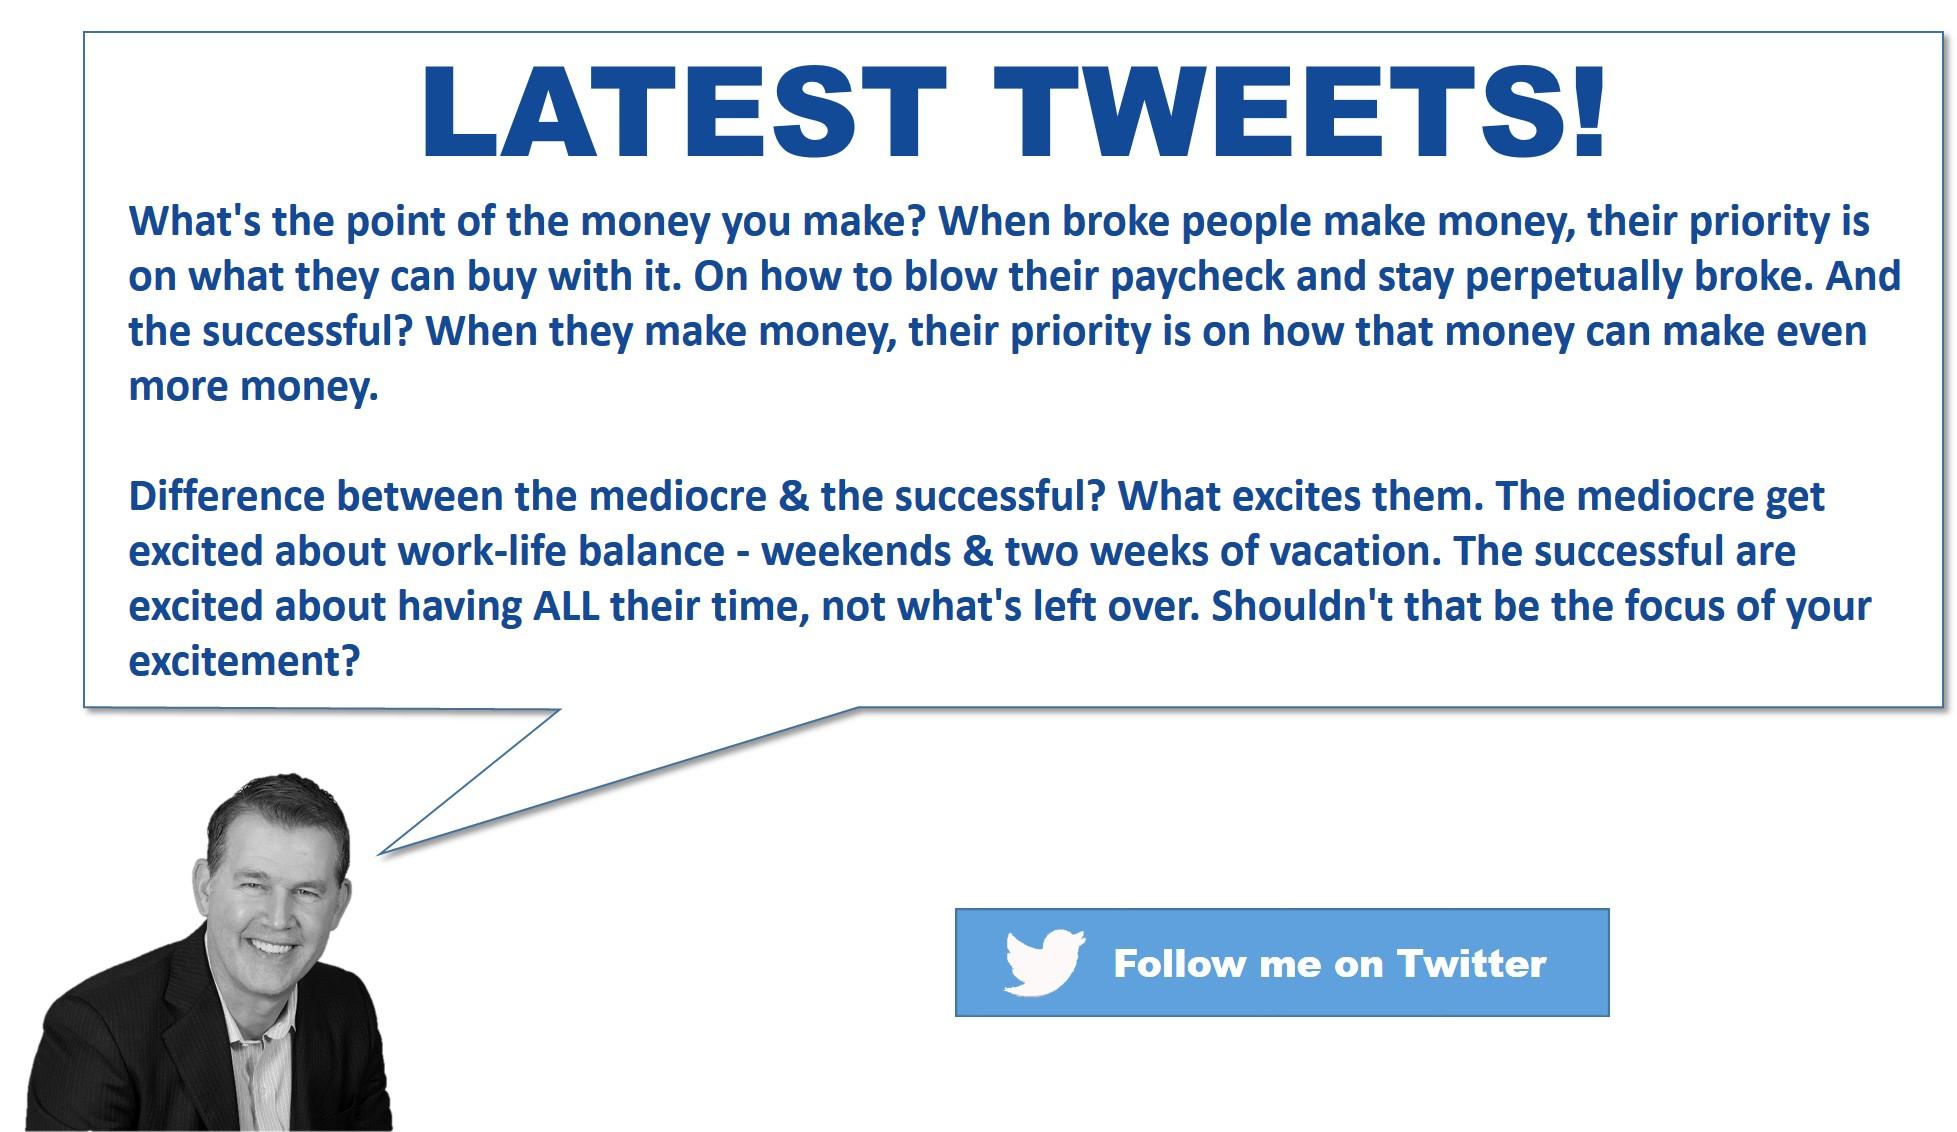 MontyCampbell-Tweets-8-18-18